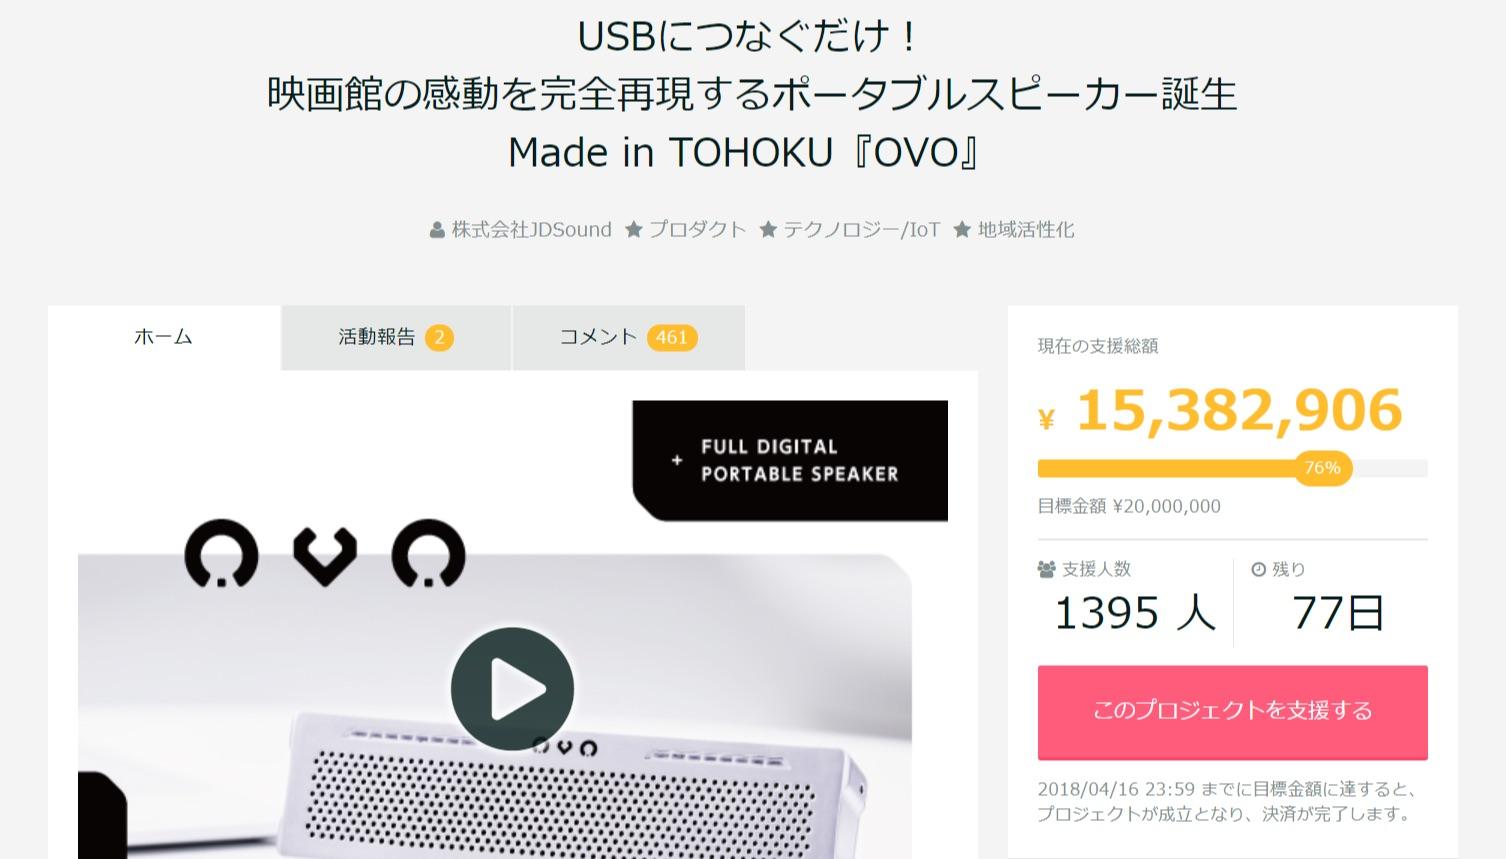 Made in TOHOKU 究極のフルデジタルスピーカー『OVO』